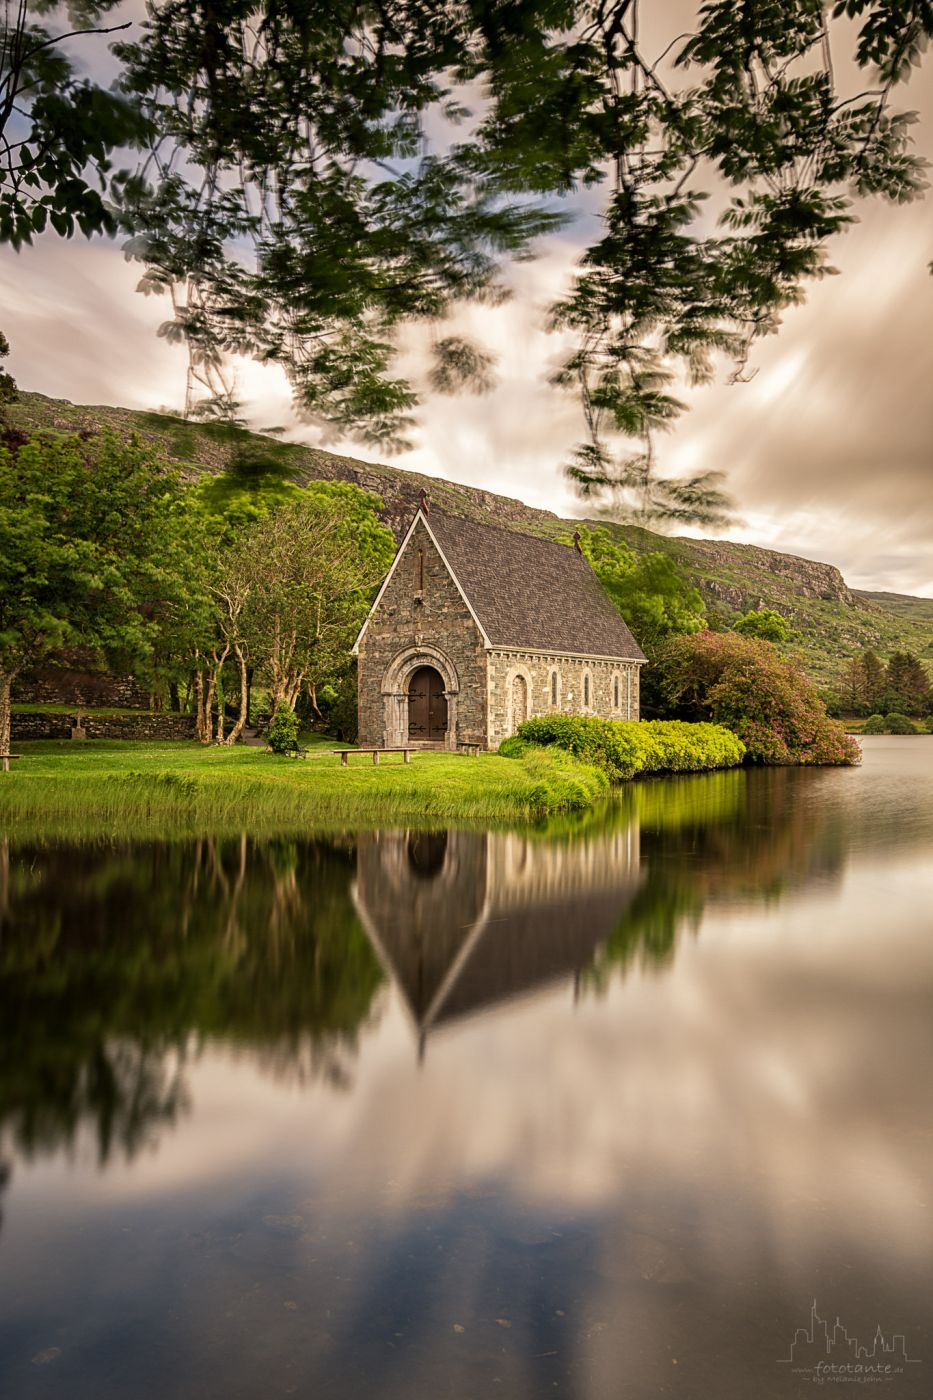 St Finbarr's Oratory, Ireland